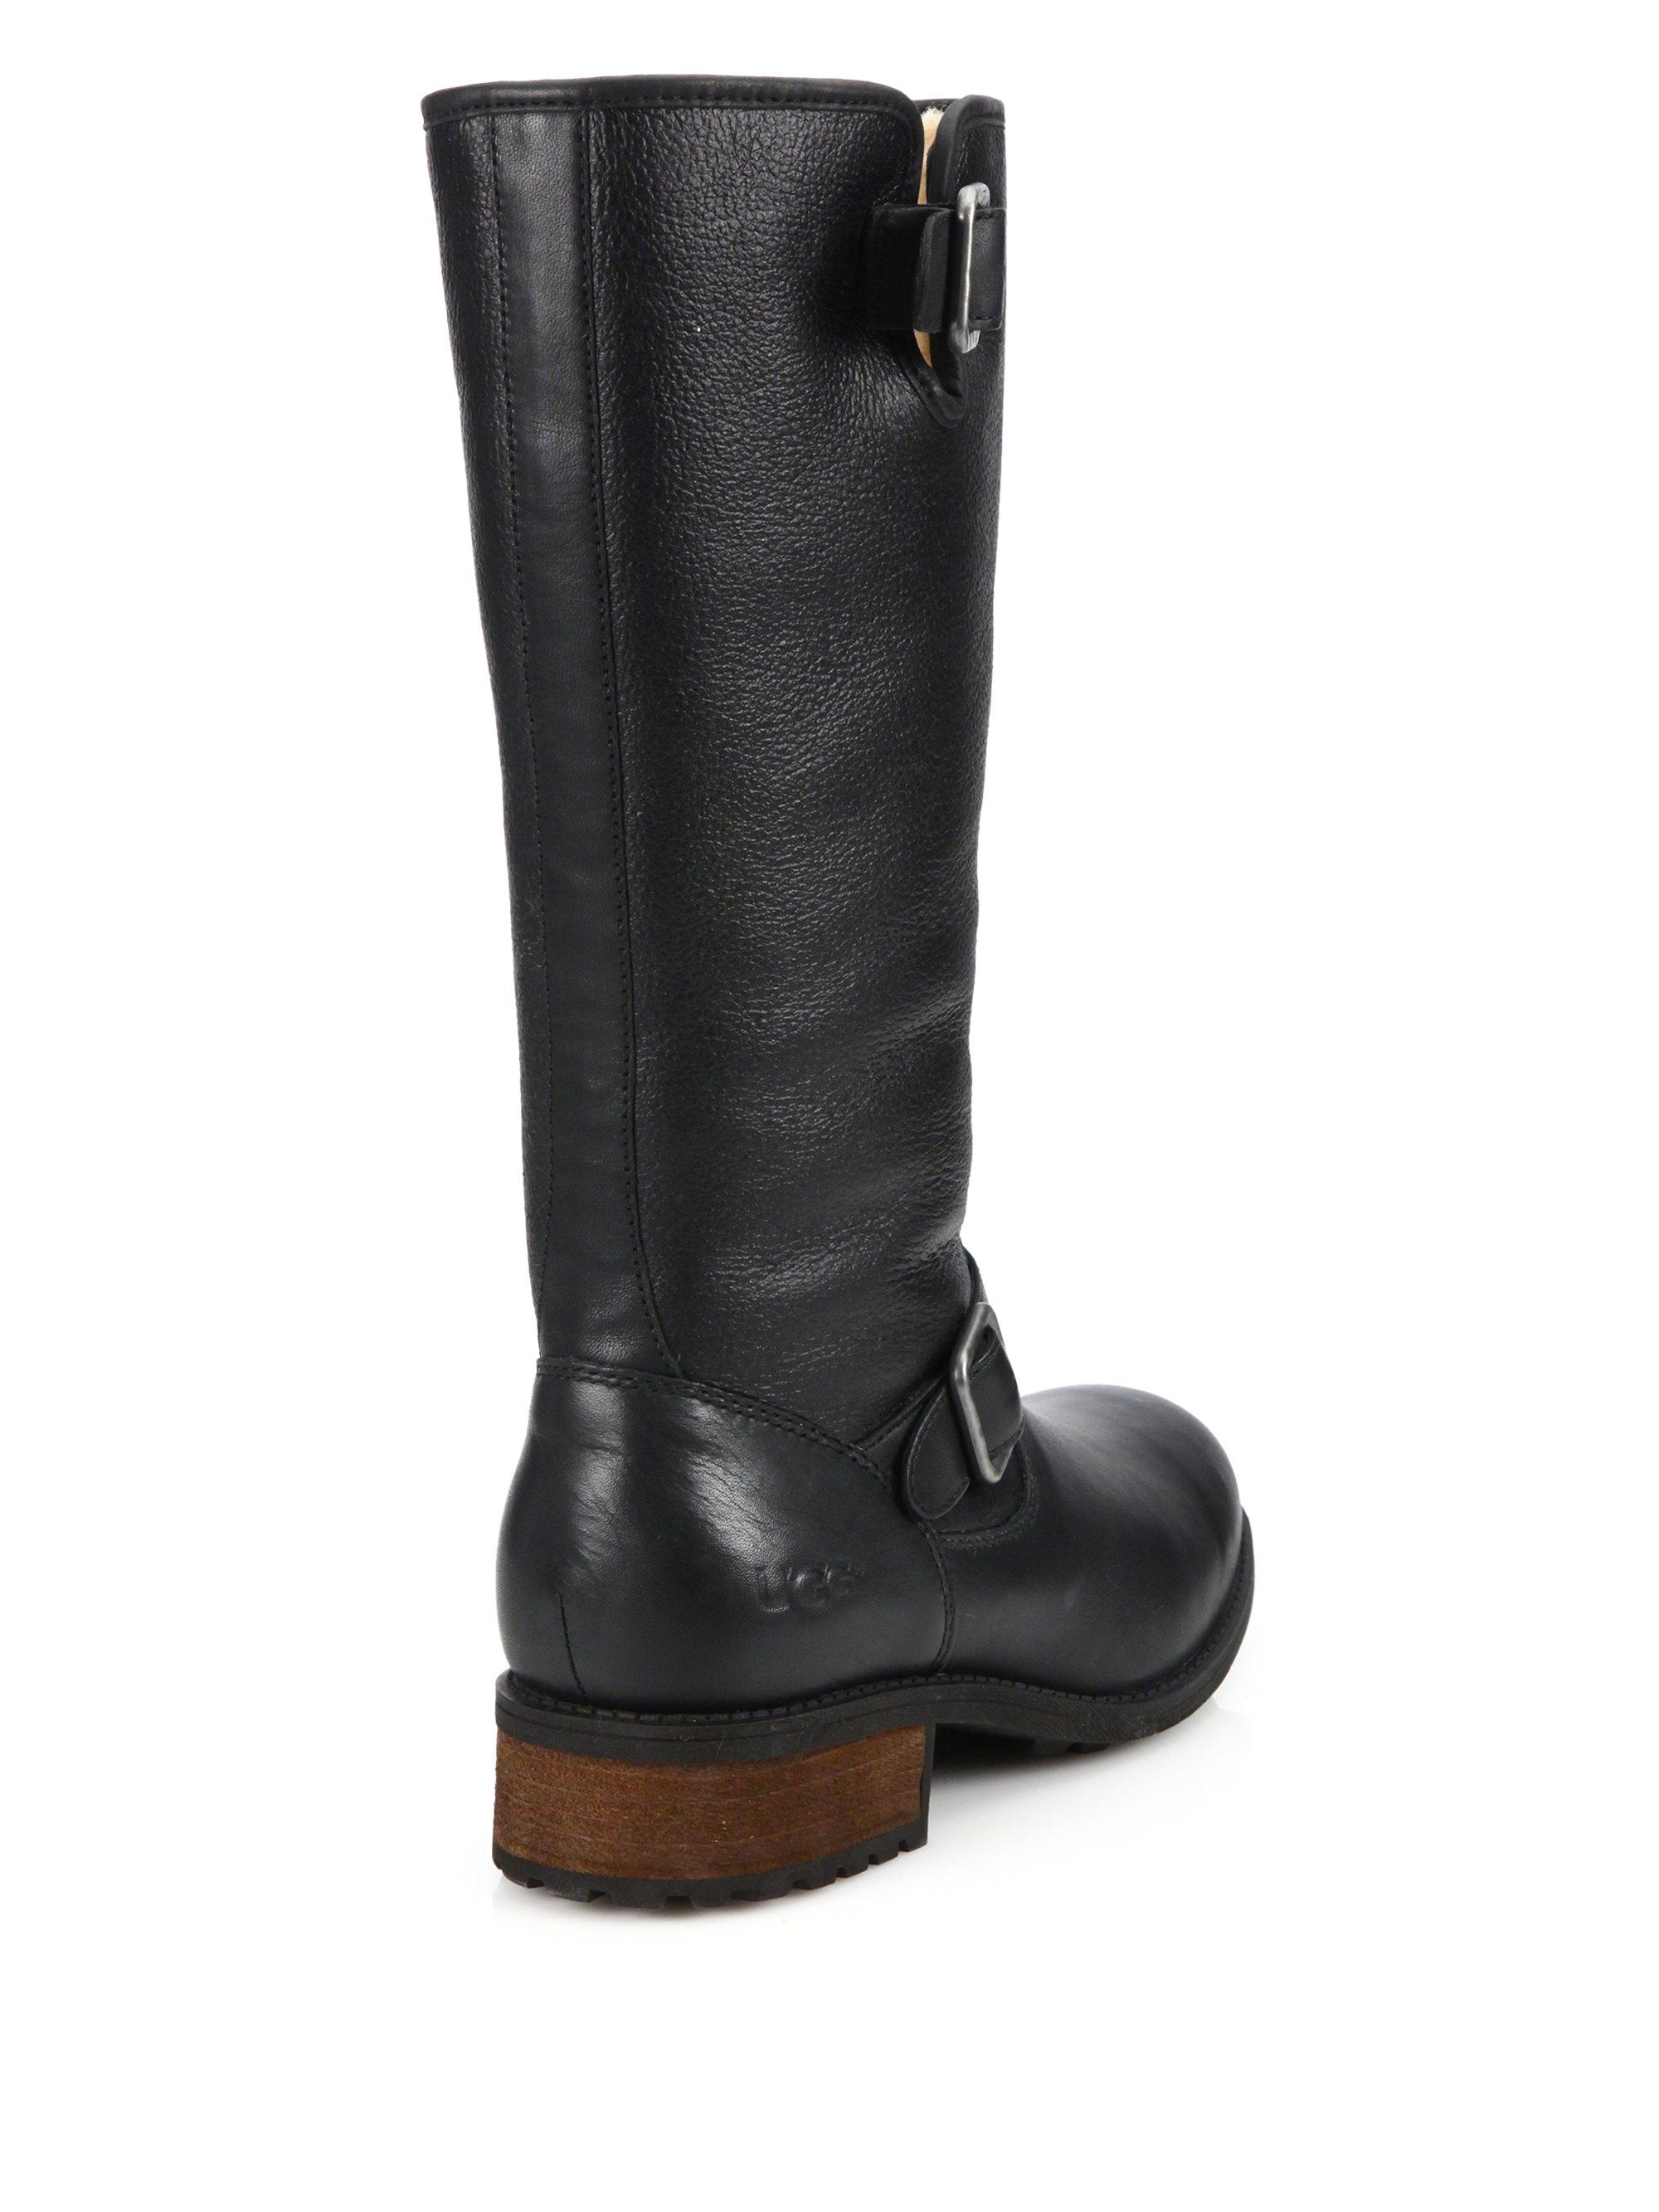 f0e77174b8f UGG Black Chancery Sheepskin & Leather Boots